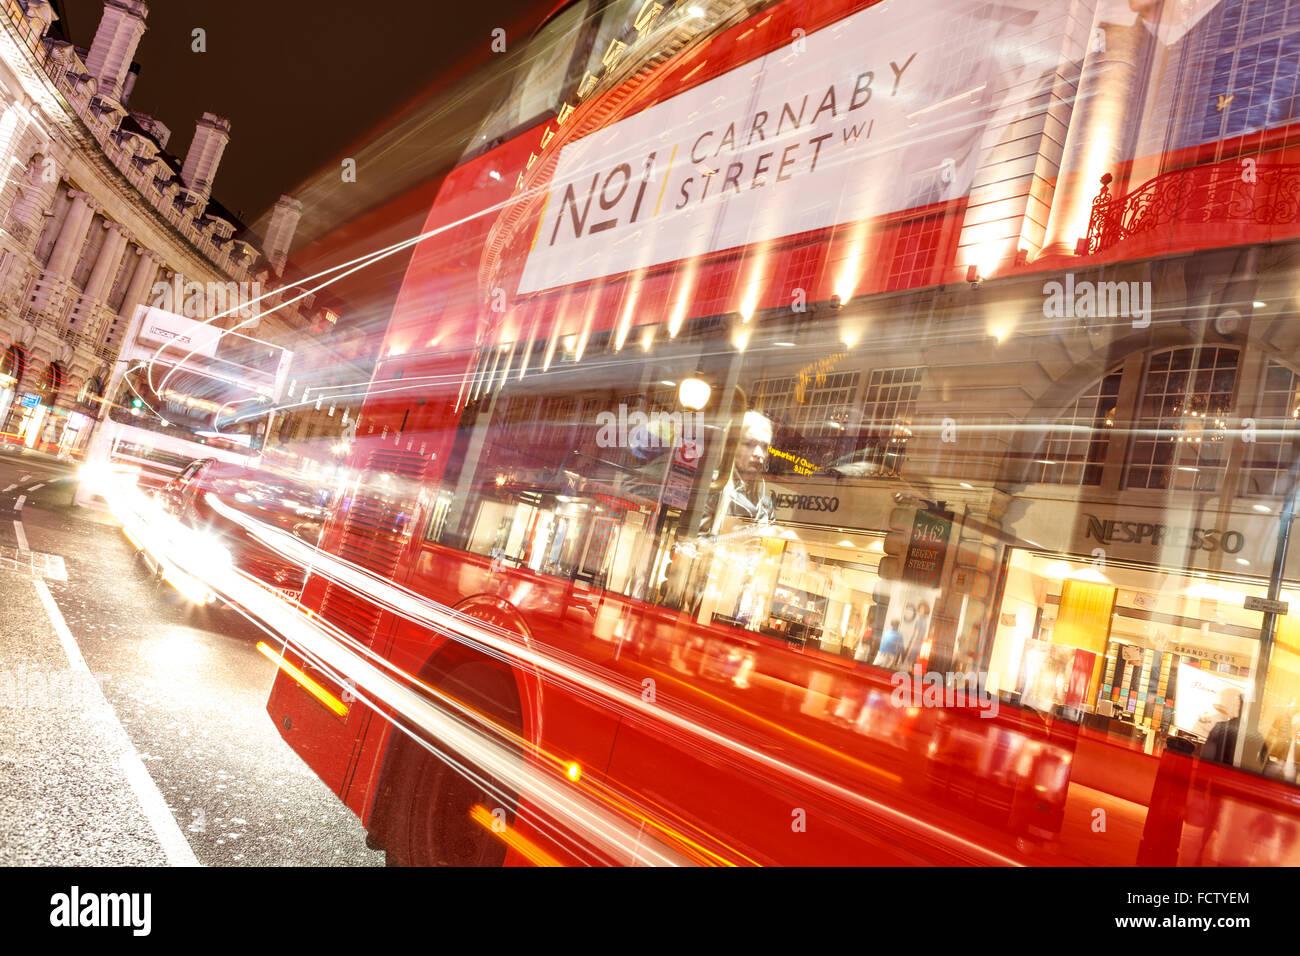 Bus rosso su Regent Street a Londra. Luci sfocate da tempi lunghi. Immagini Stock